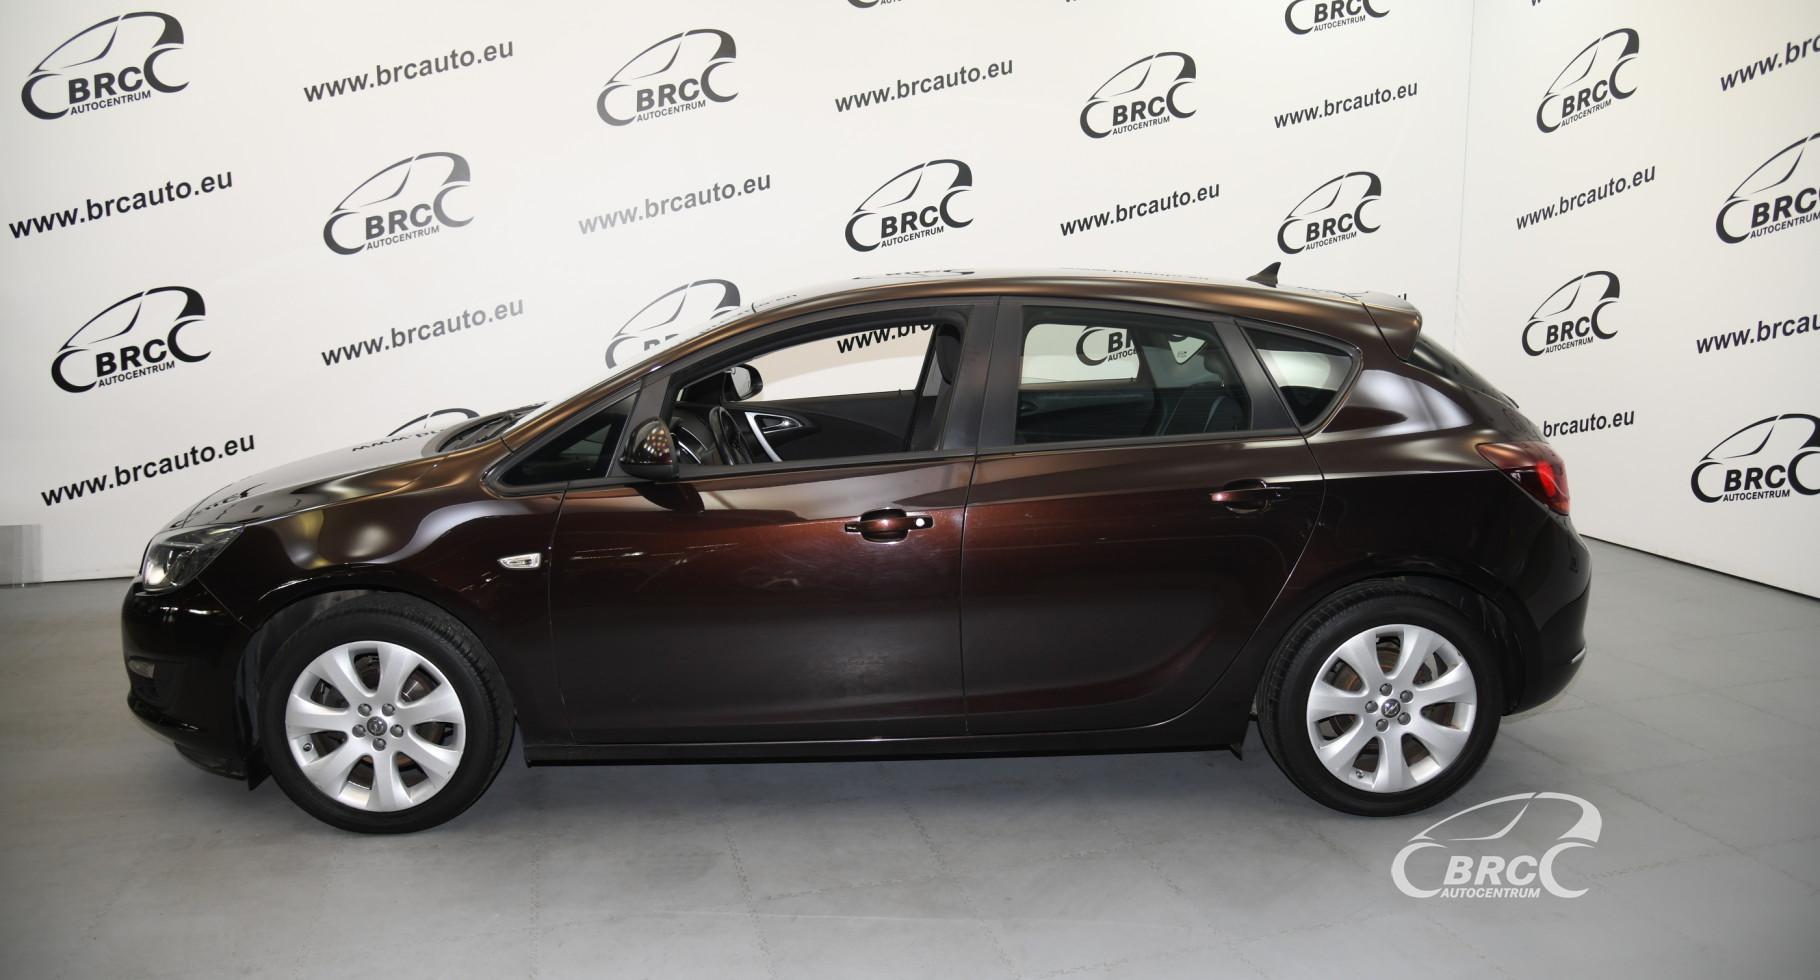 Opel Astra 1.4 i Turbo Cosmo